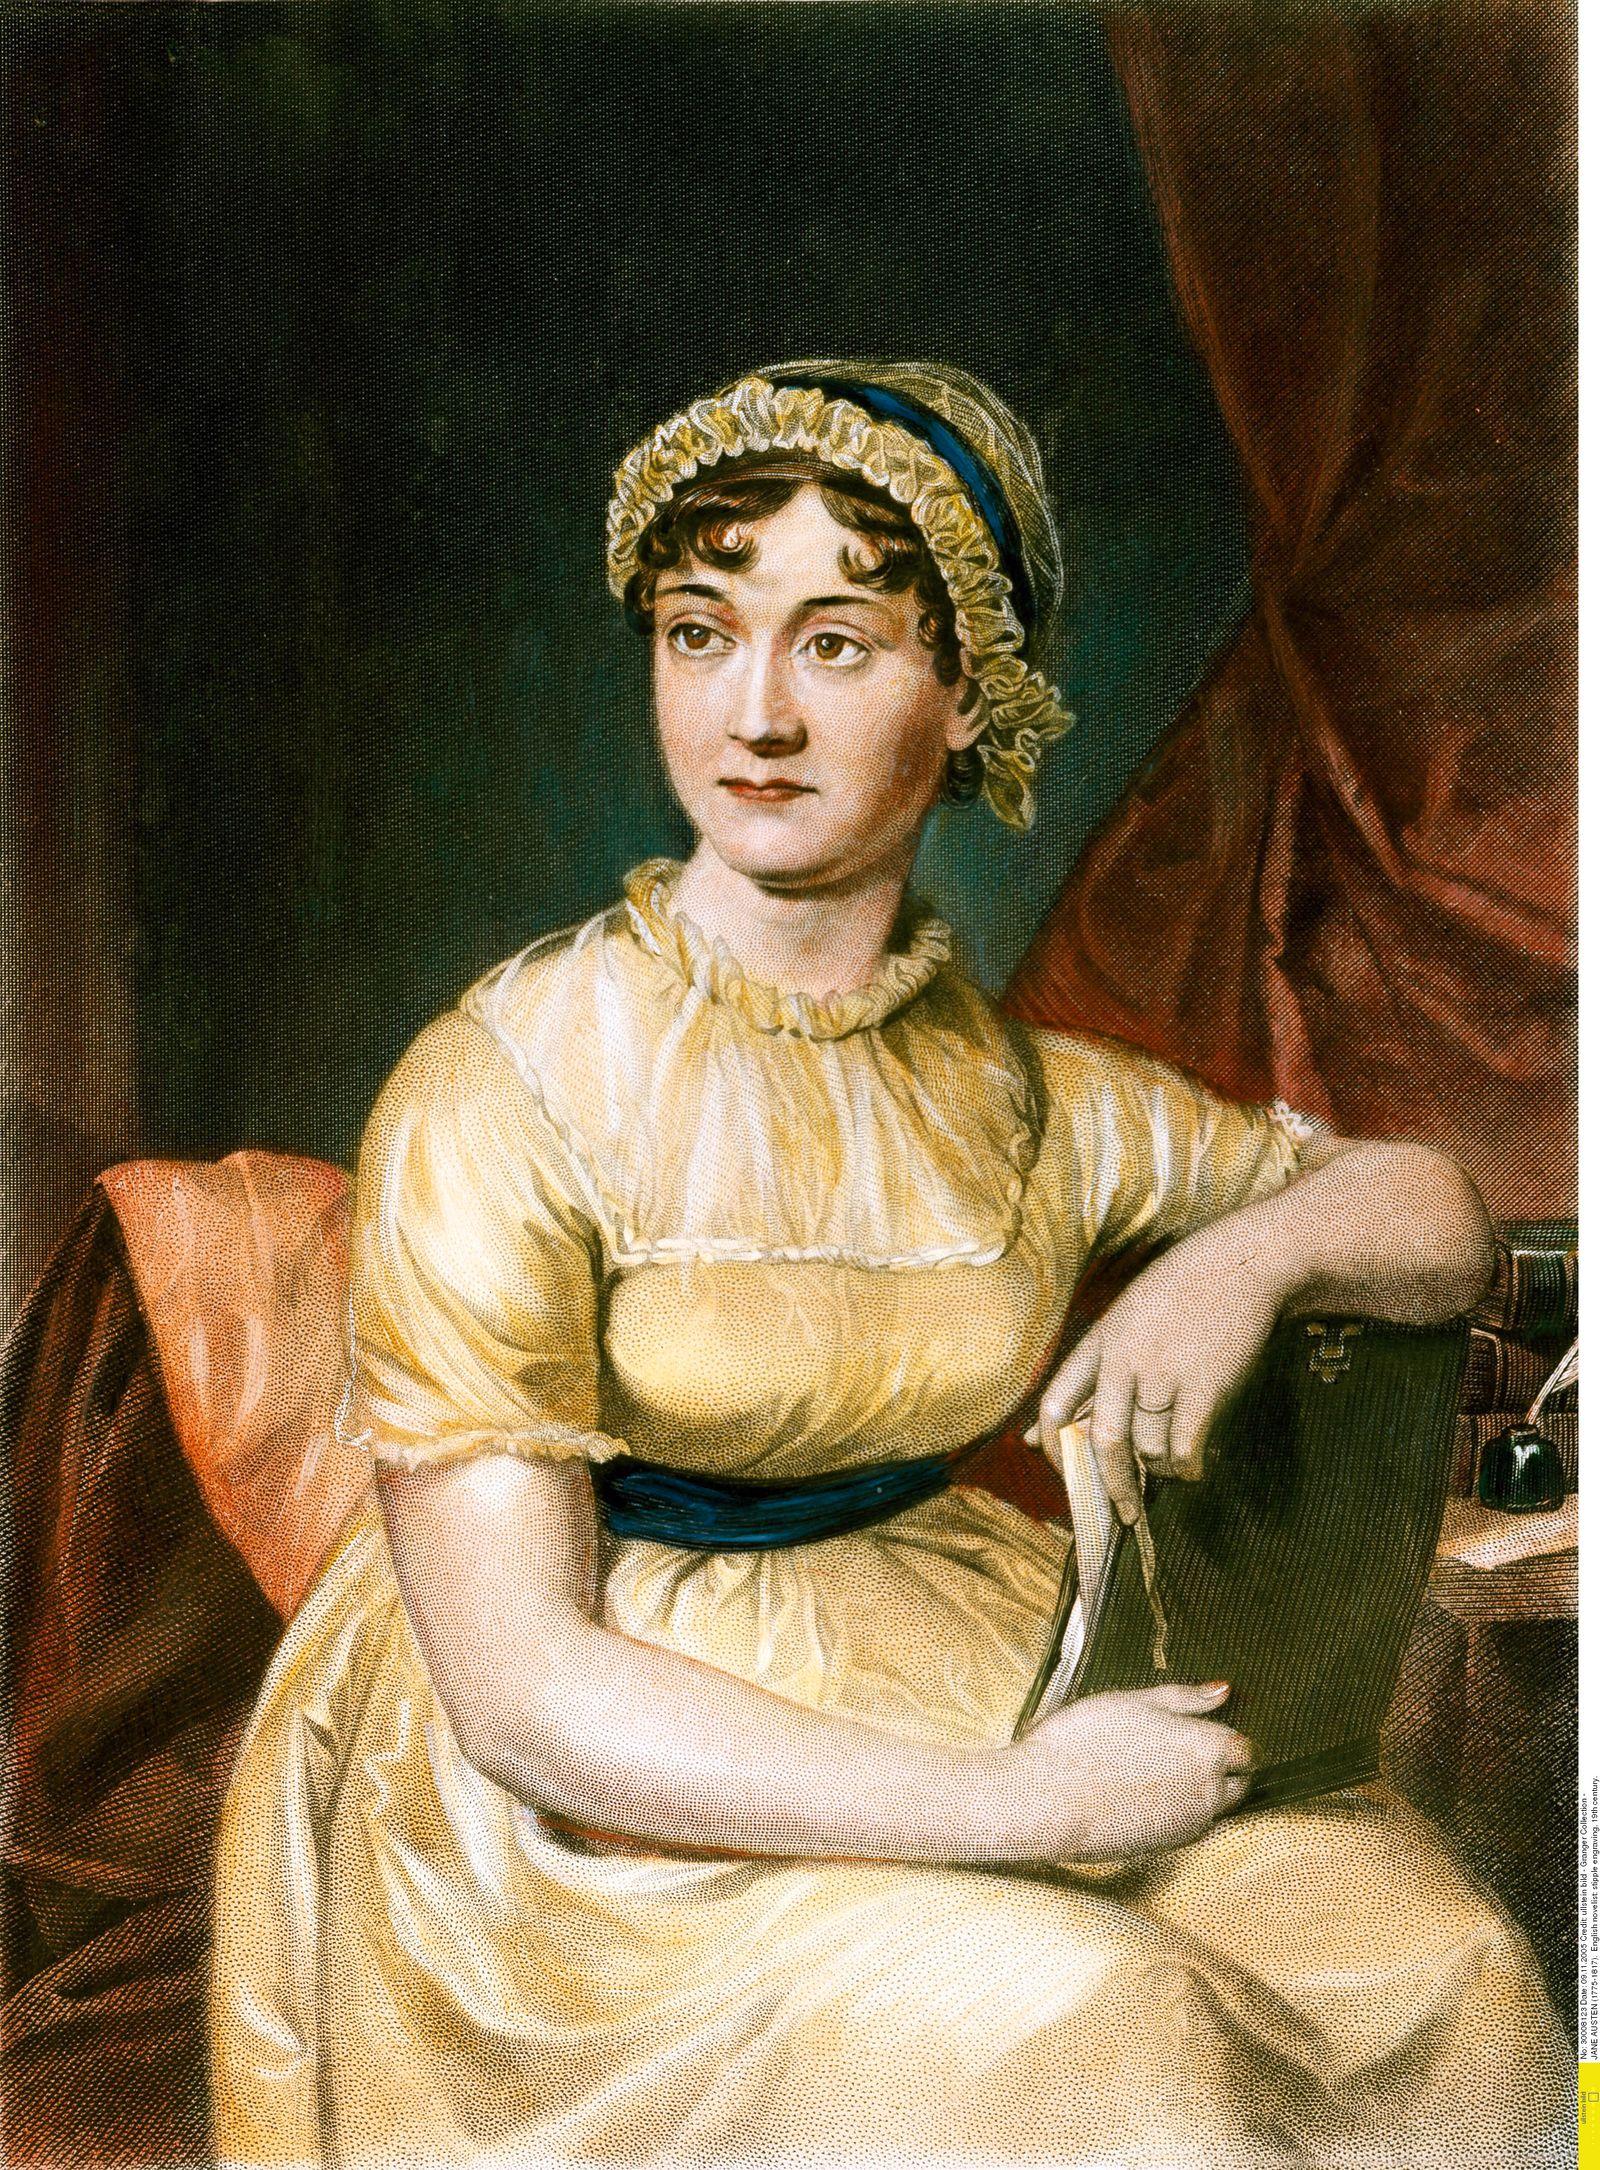 JANE AUSTEN (1775-1817). English novelist: stipple engraving, 19th century.